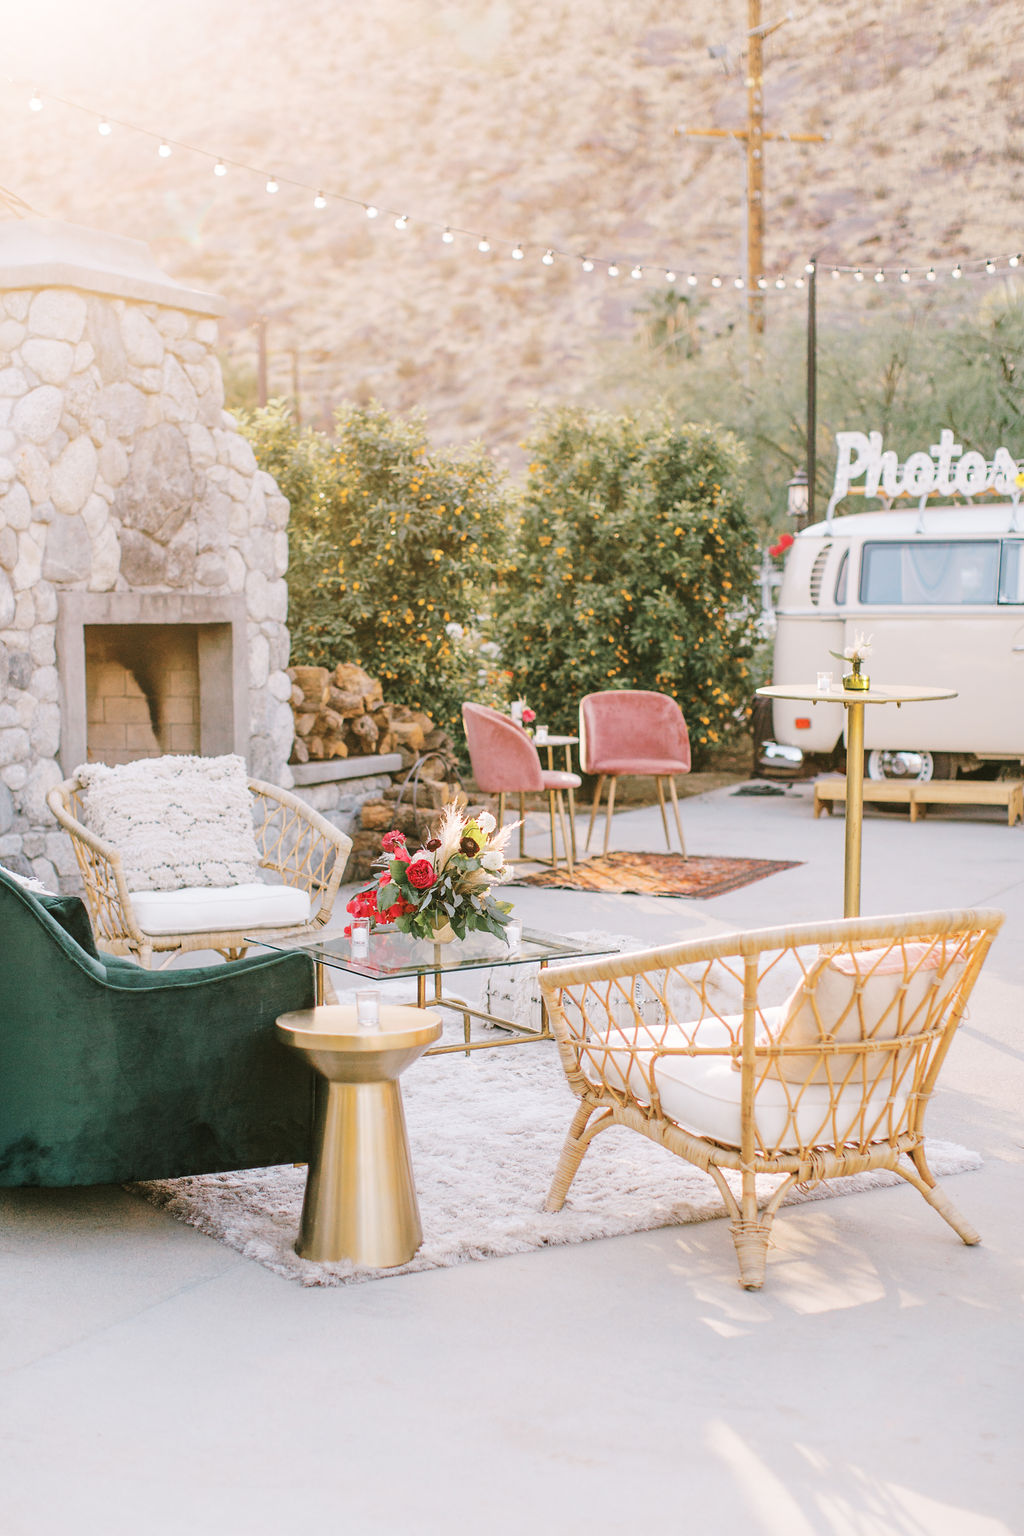 meagan robert wedding lounge area